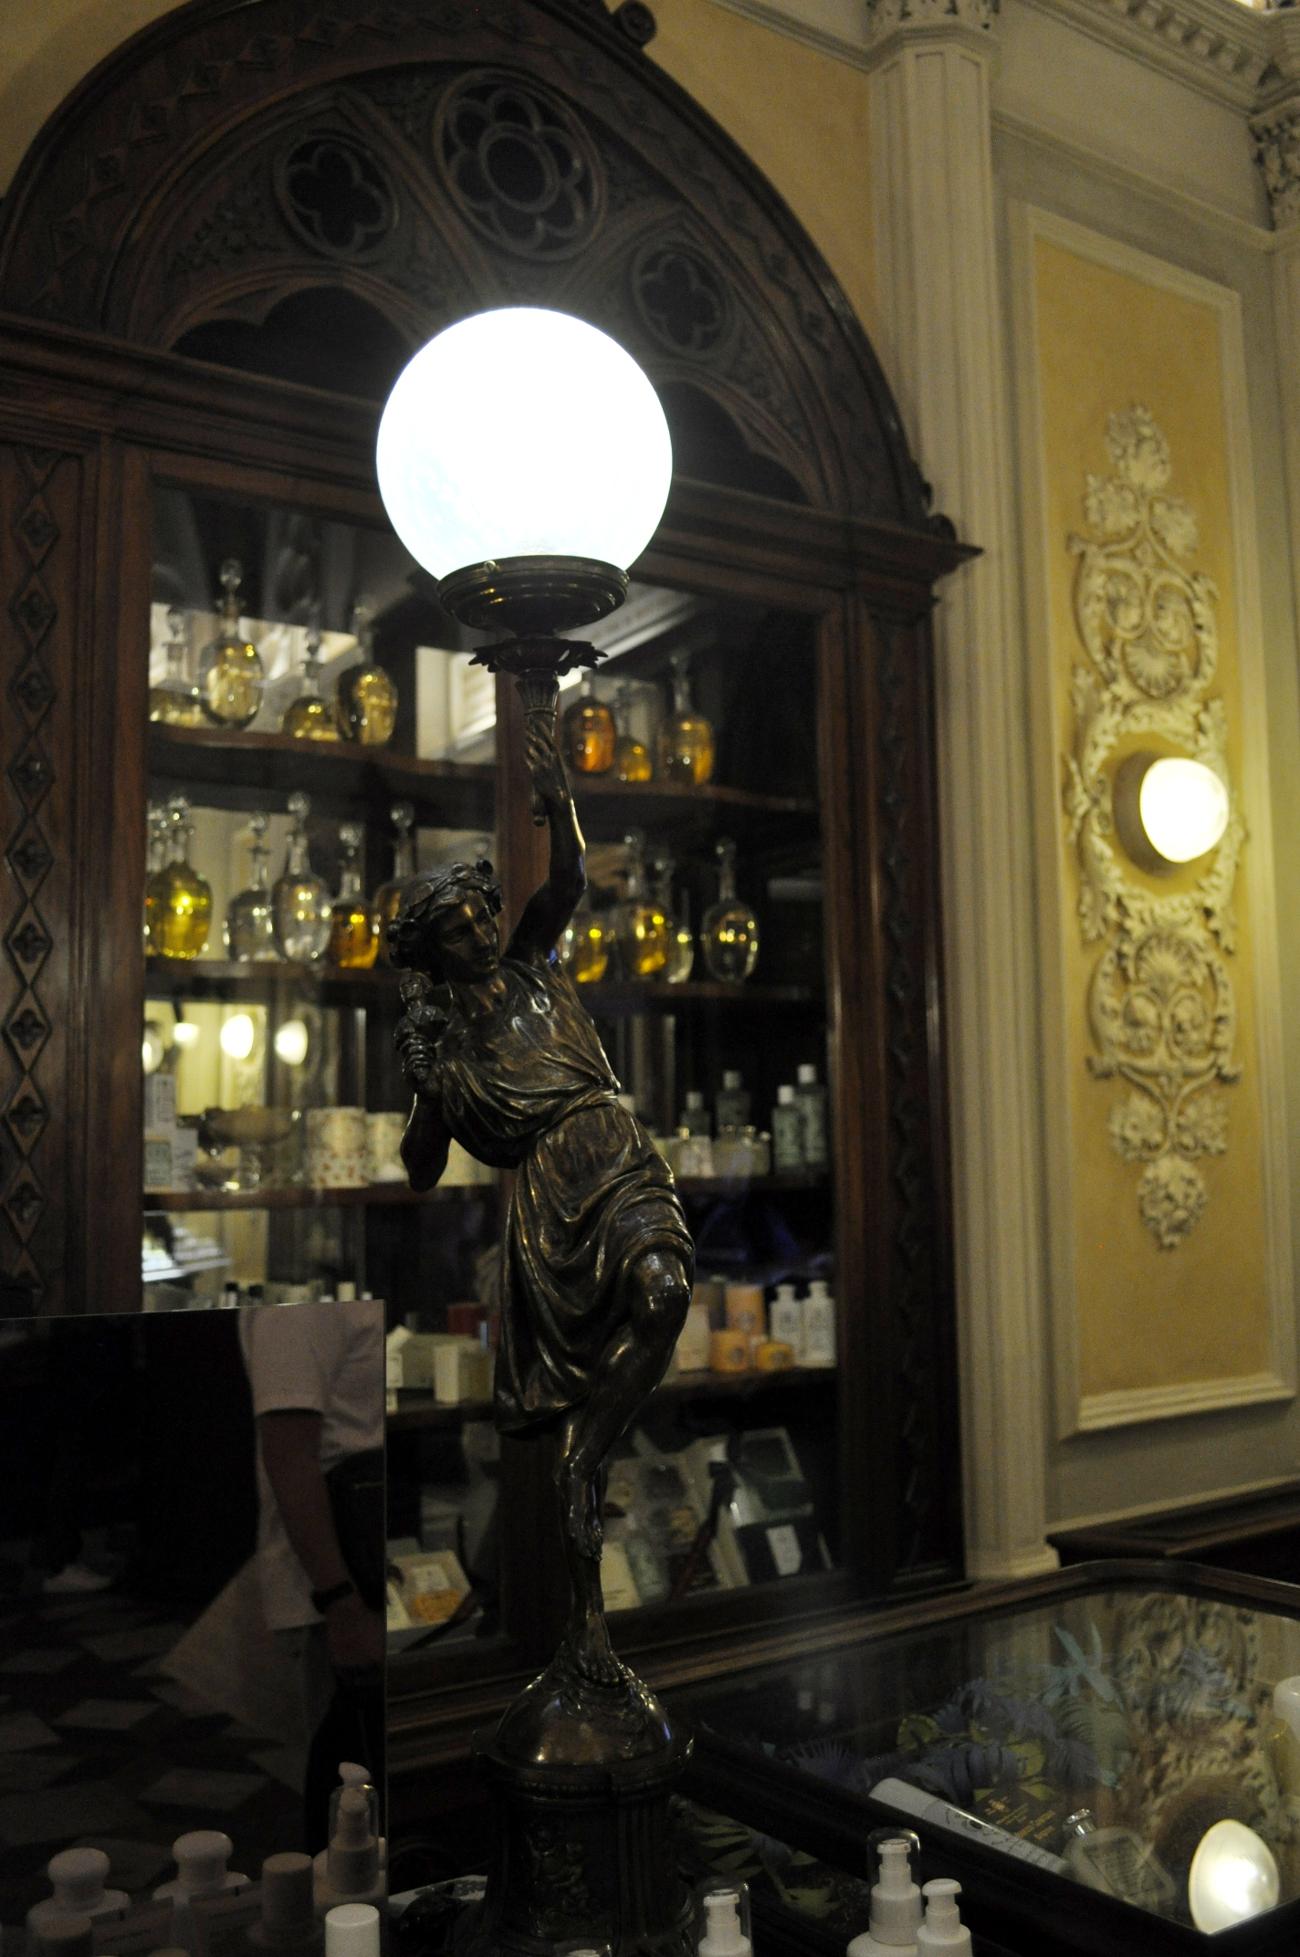 rocaille-blog-officina-profumo-farmaceutica-santa-maria-novella-shop-negozio-storico-sede-firenze-77